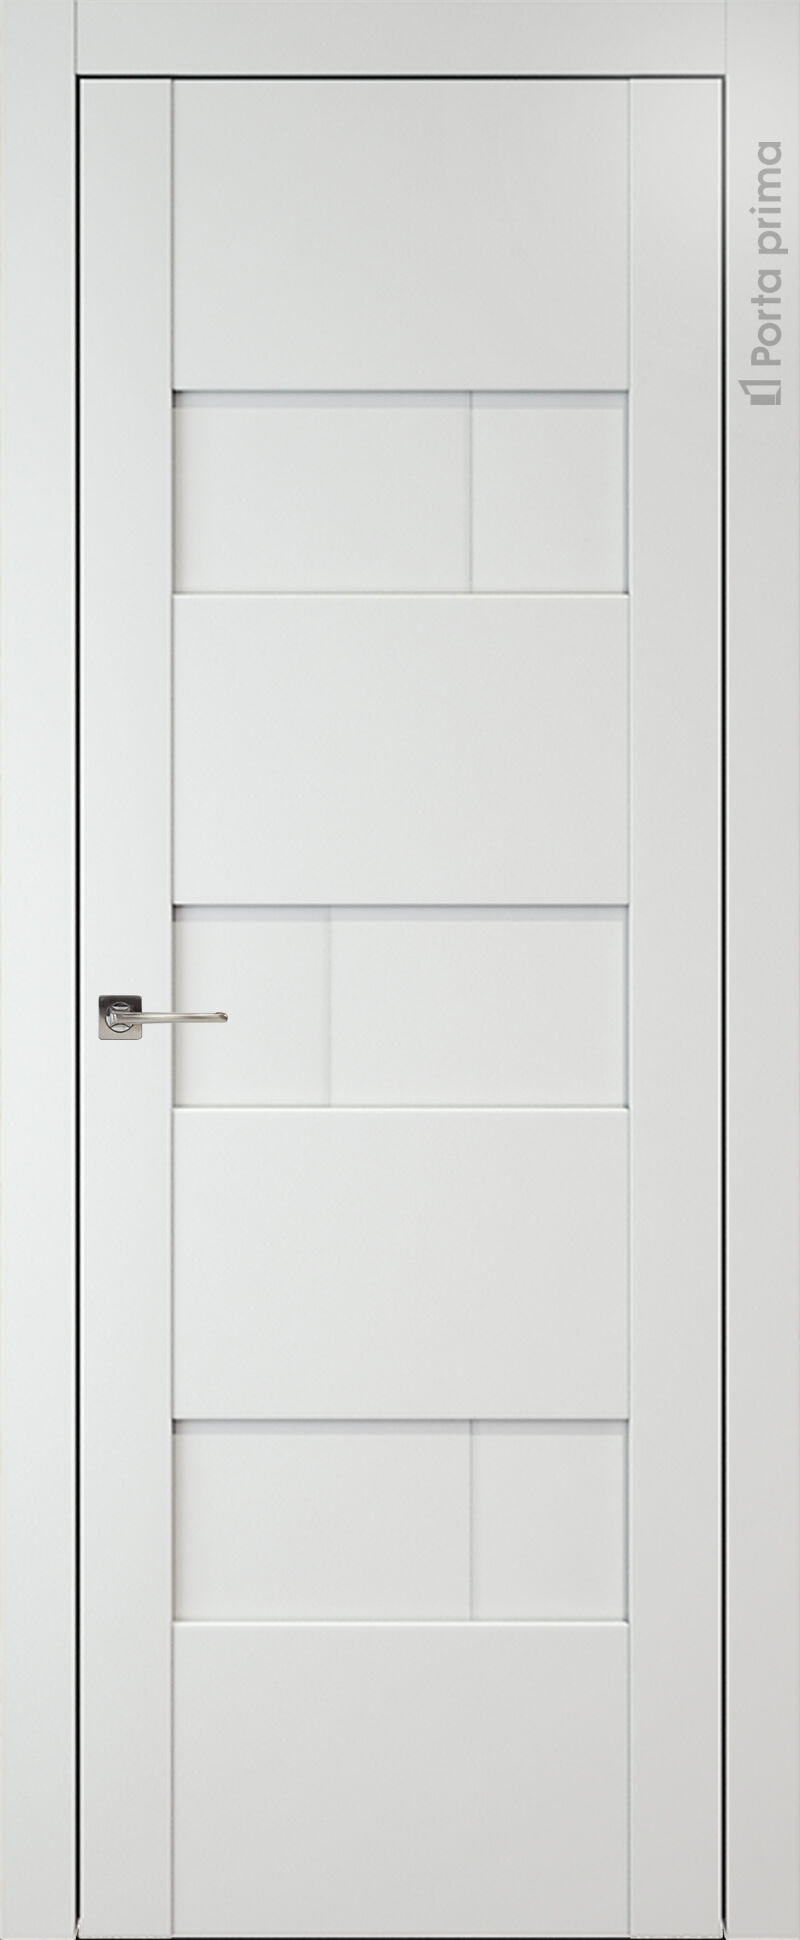 Vicenza цвет - Белая эмаль (RAL 9003) Без стекла (ДГ)